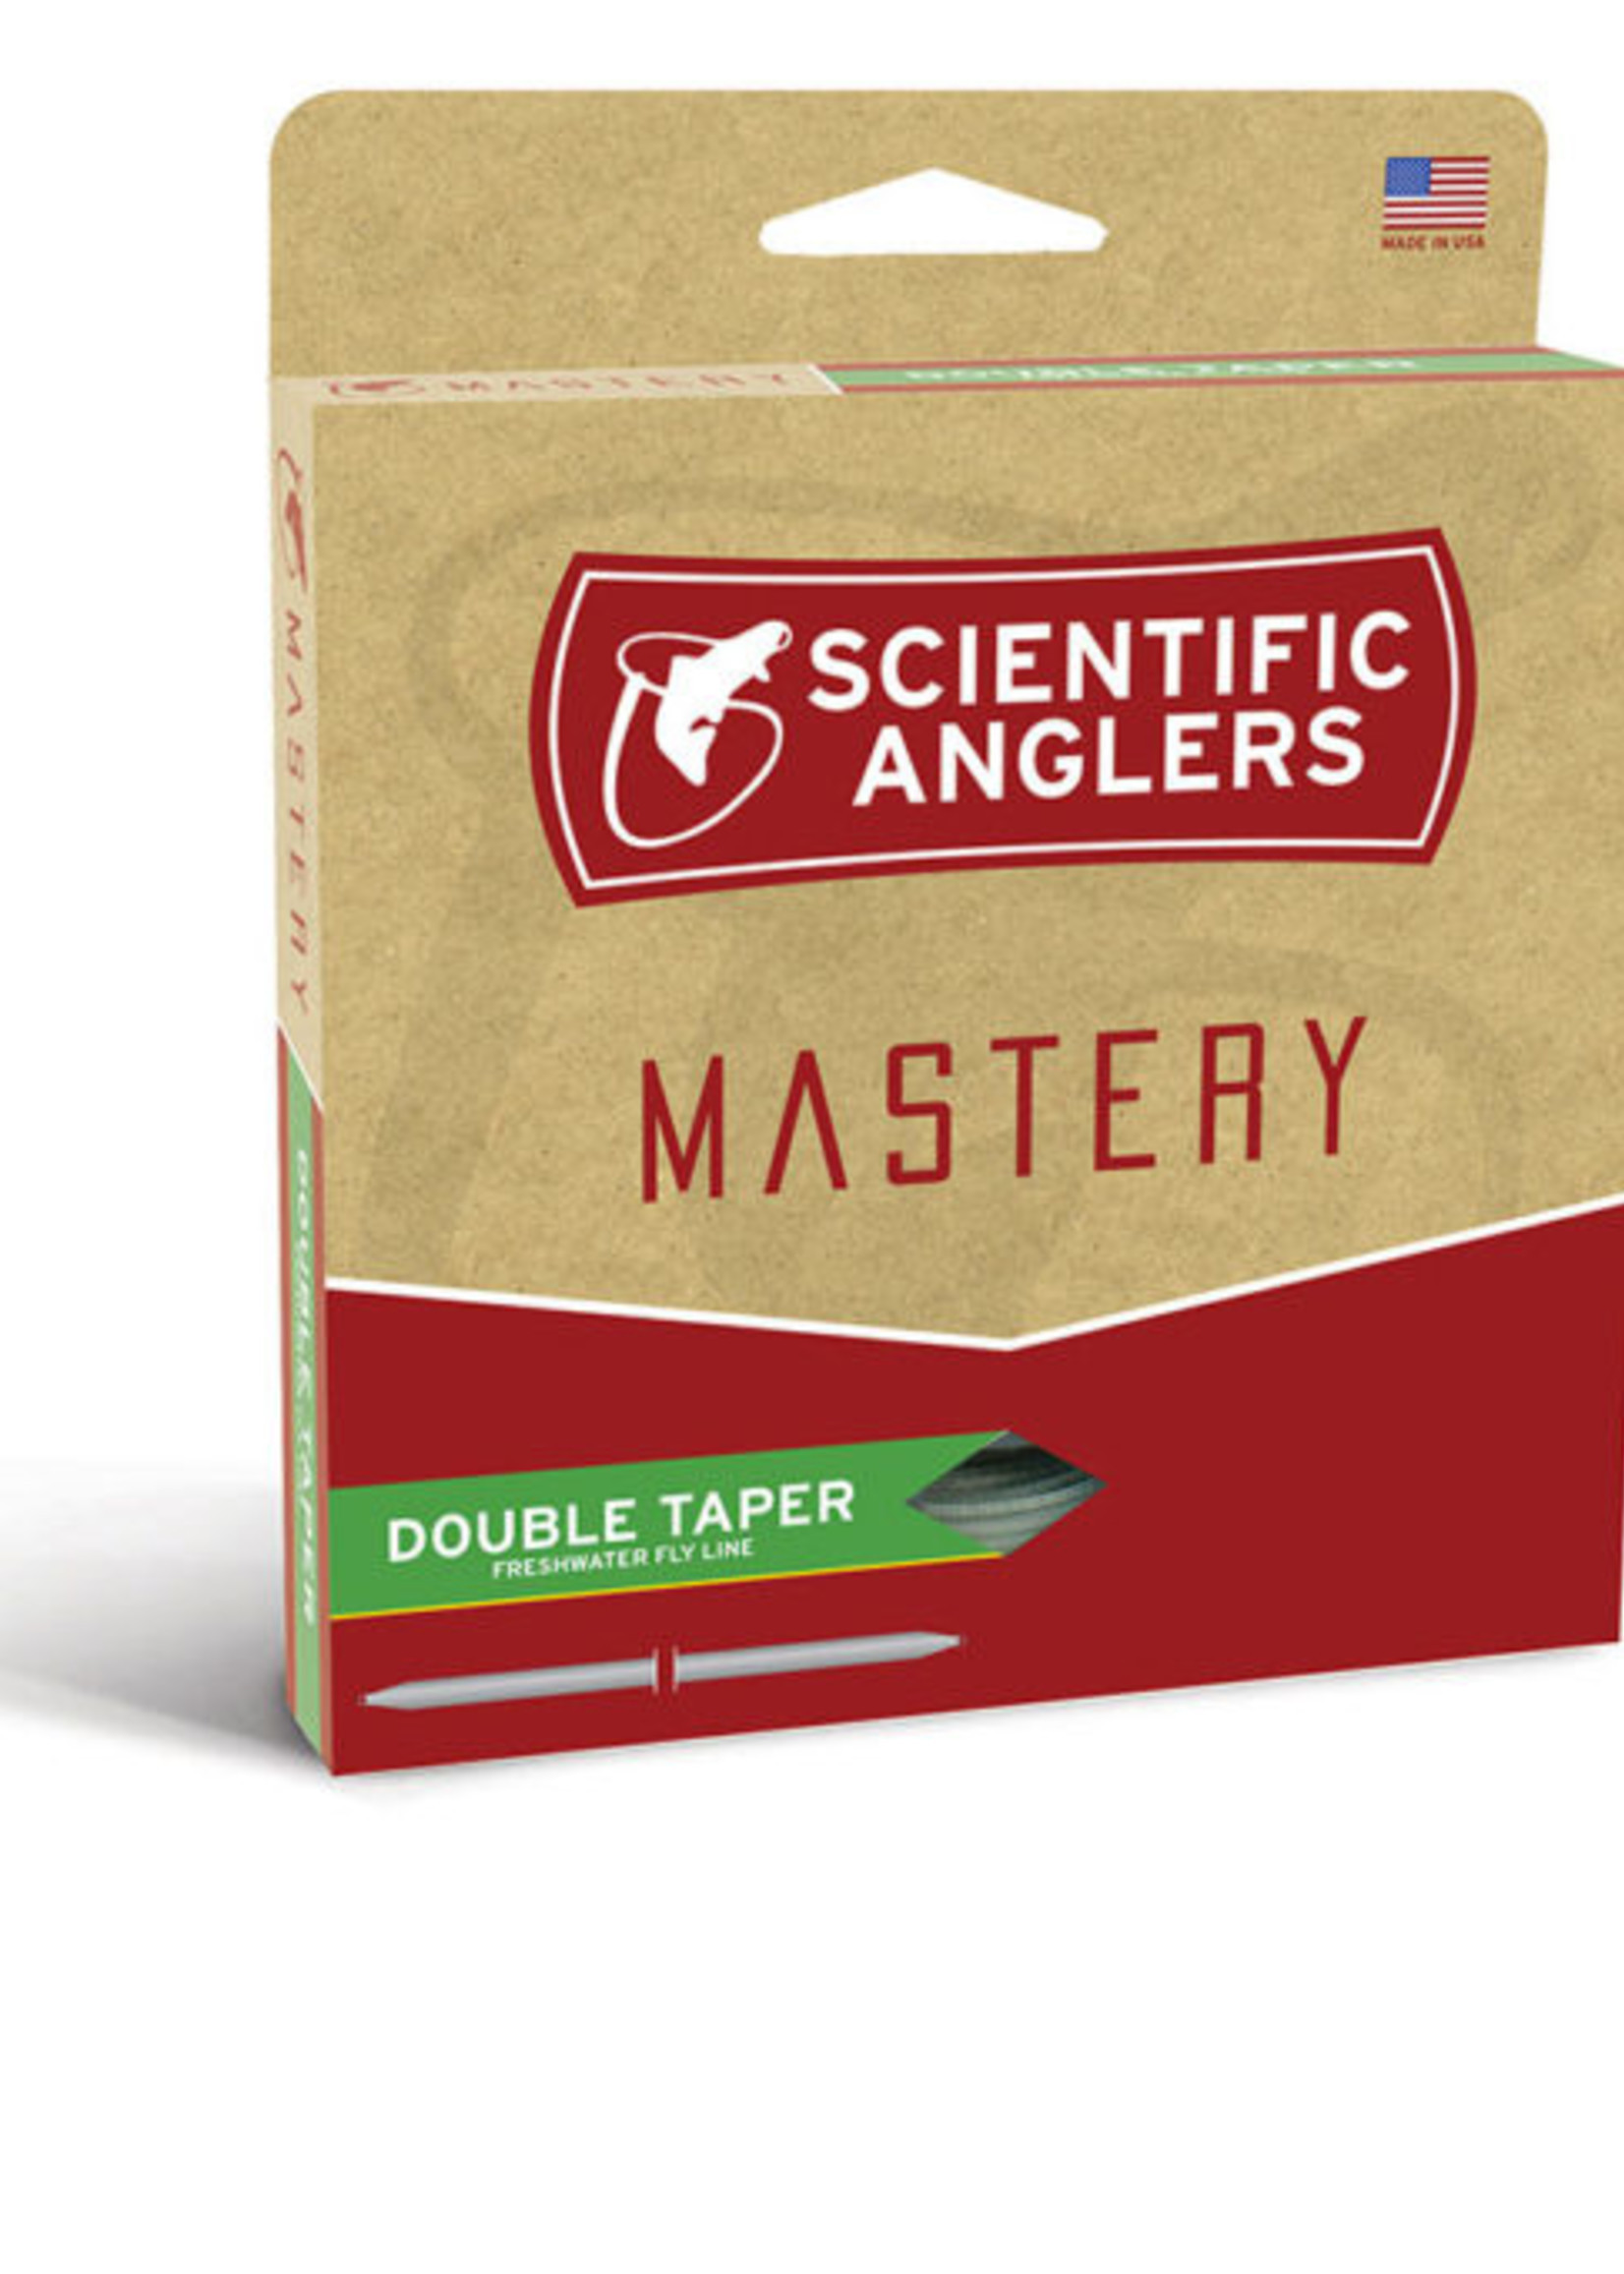 SCIENTIFIC ANGLERS MASTERY DOUBLE TAPER